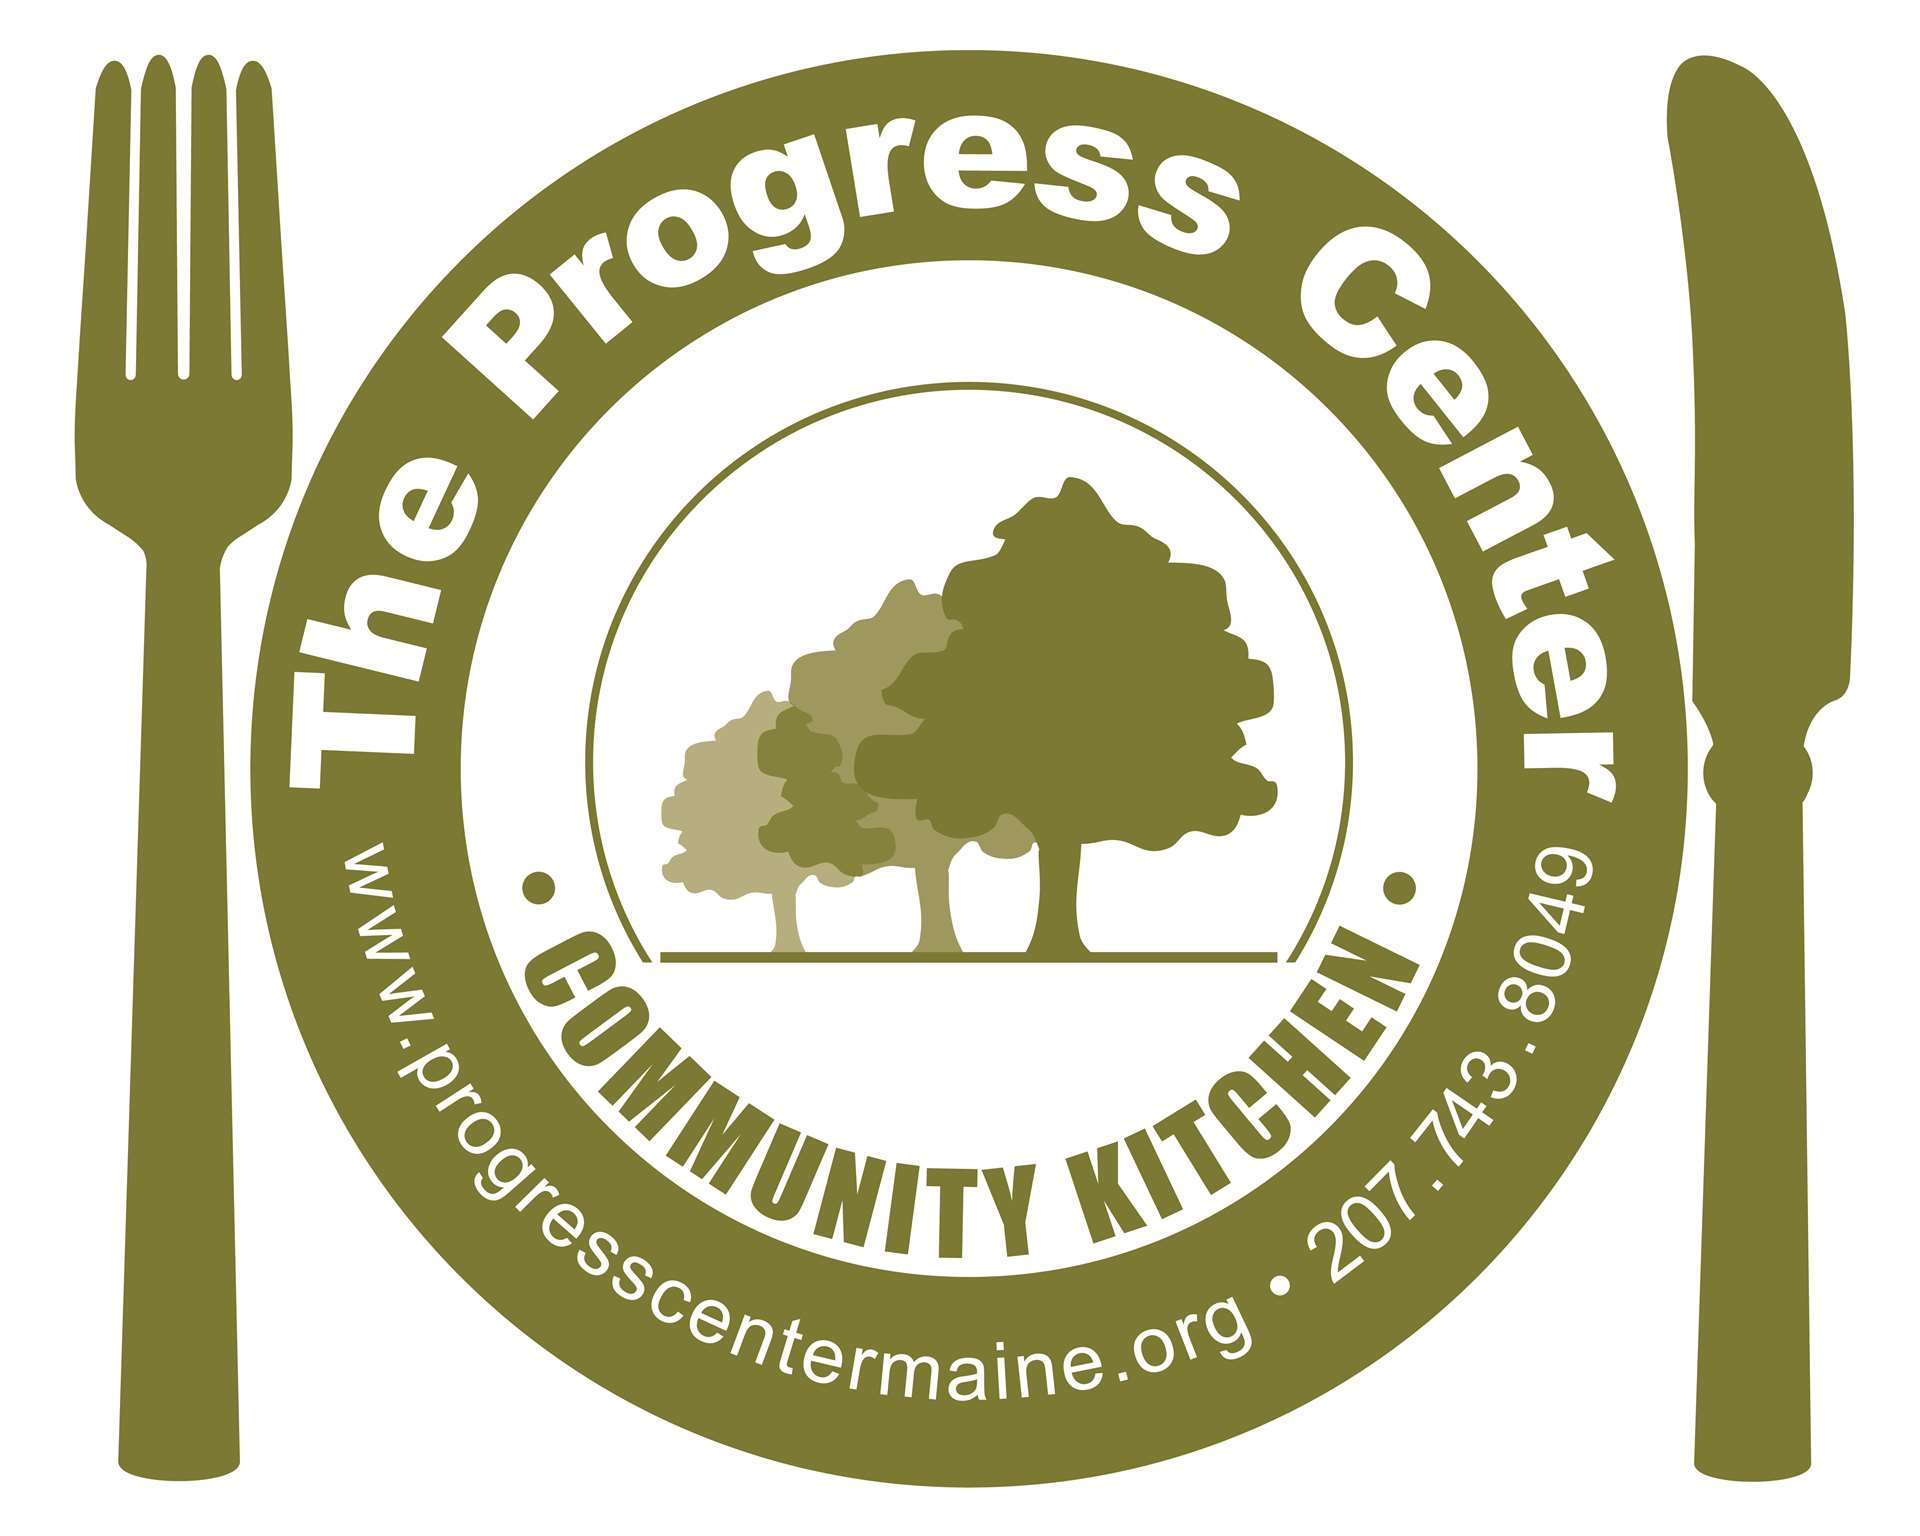 progress center community kitchen logo color - Kitchen Logo